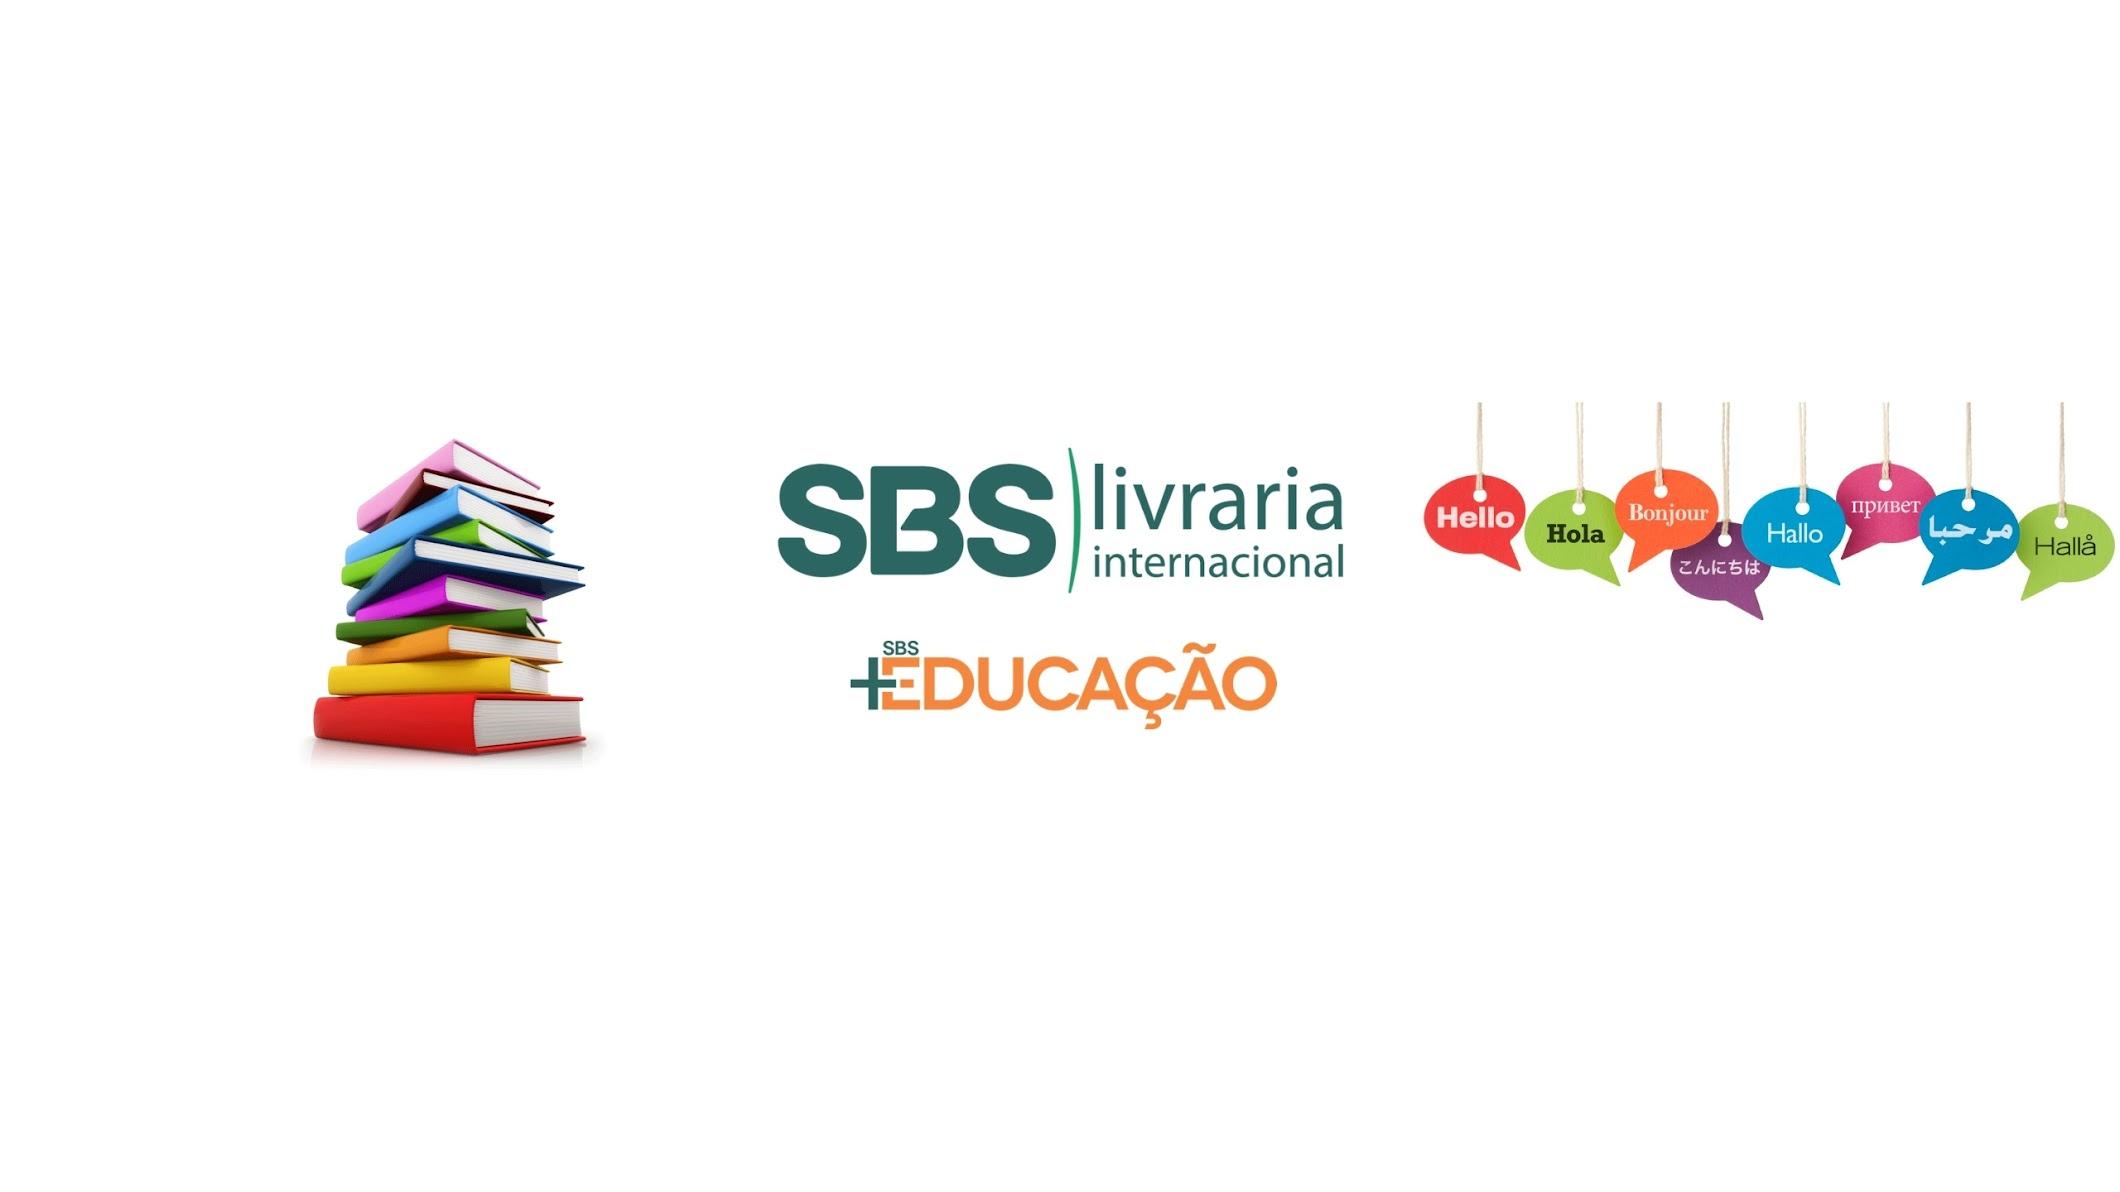 SBS Livraria Internacional